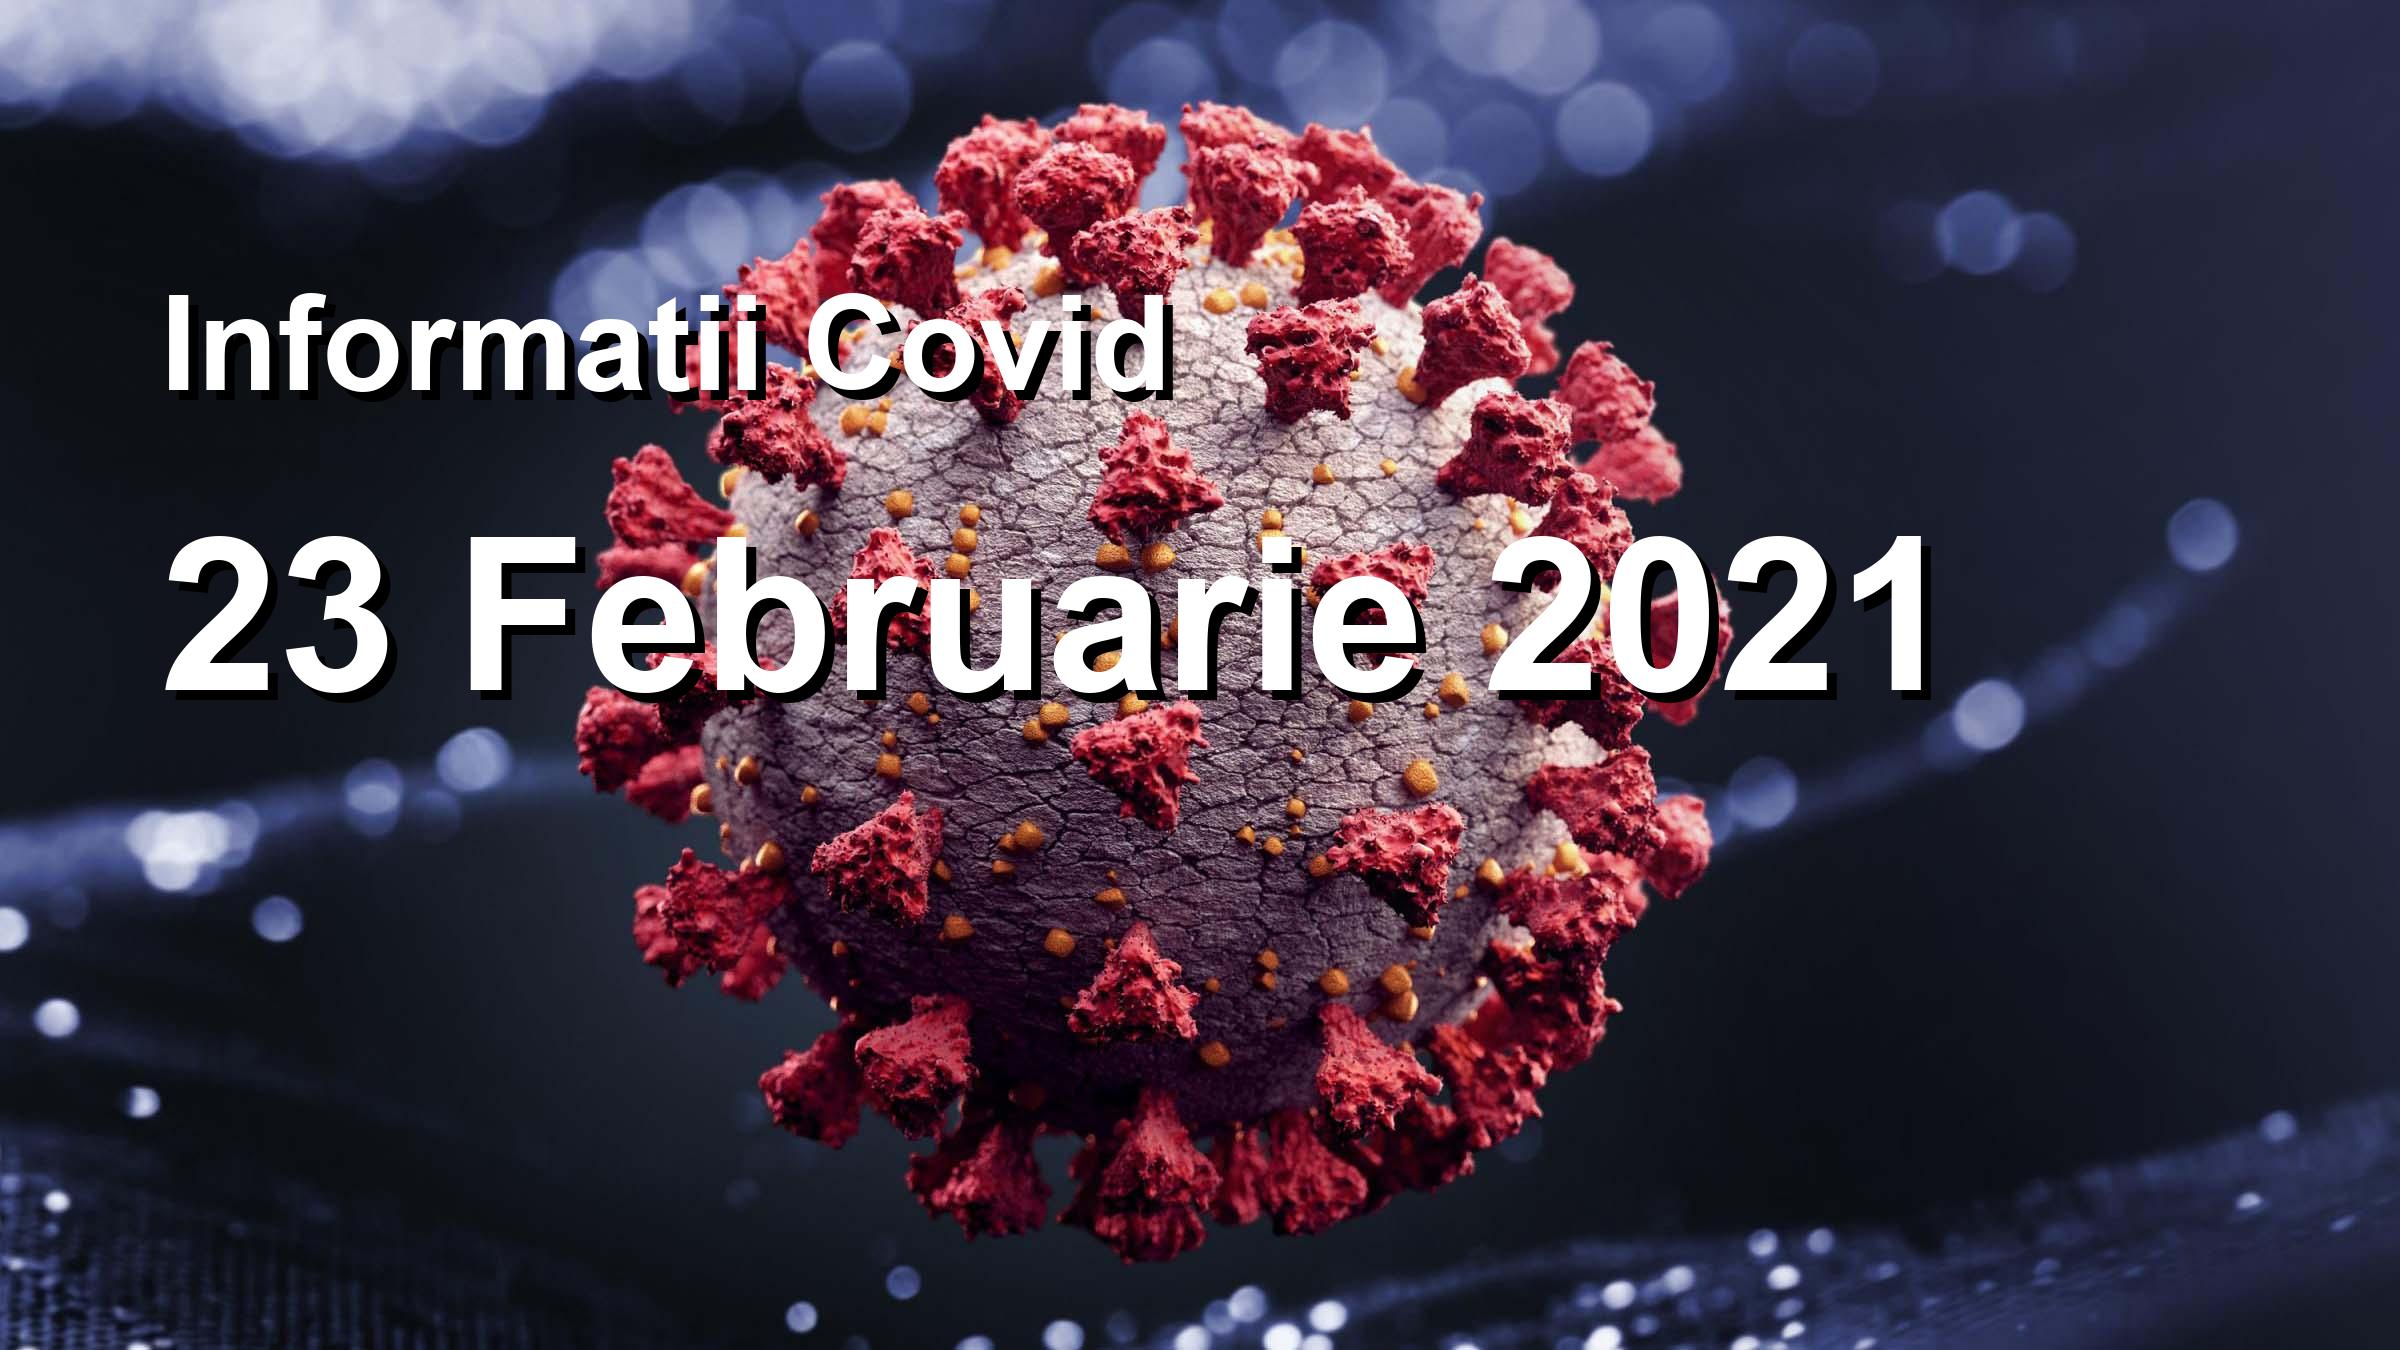 Informatii Covid-19 pentru 23 Februarie 2021: 3382 infectari, 32980 teste. | Coronavirus Romania